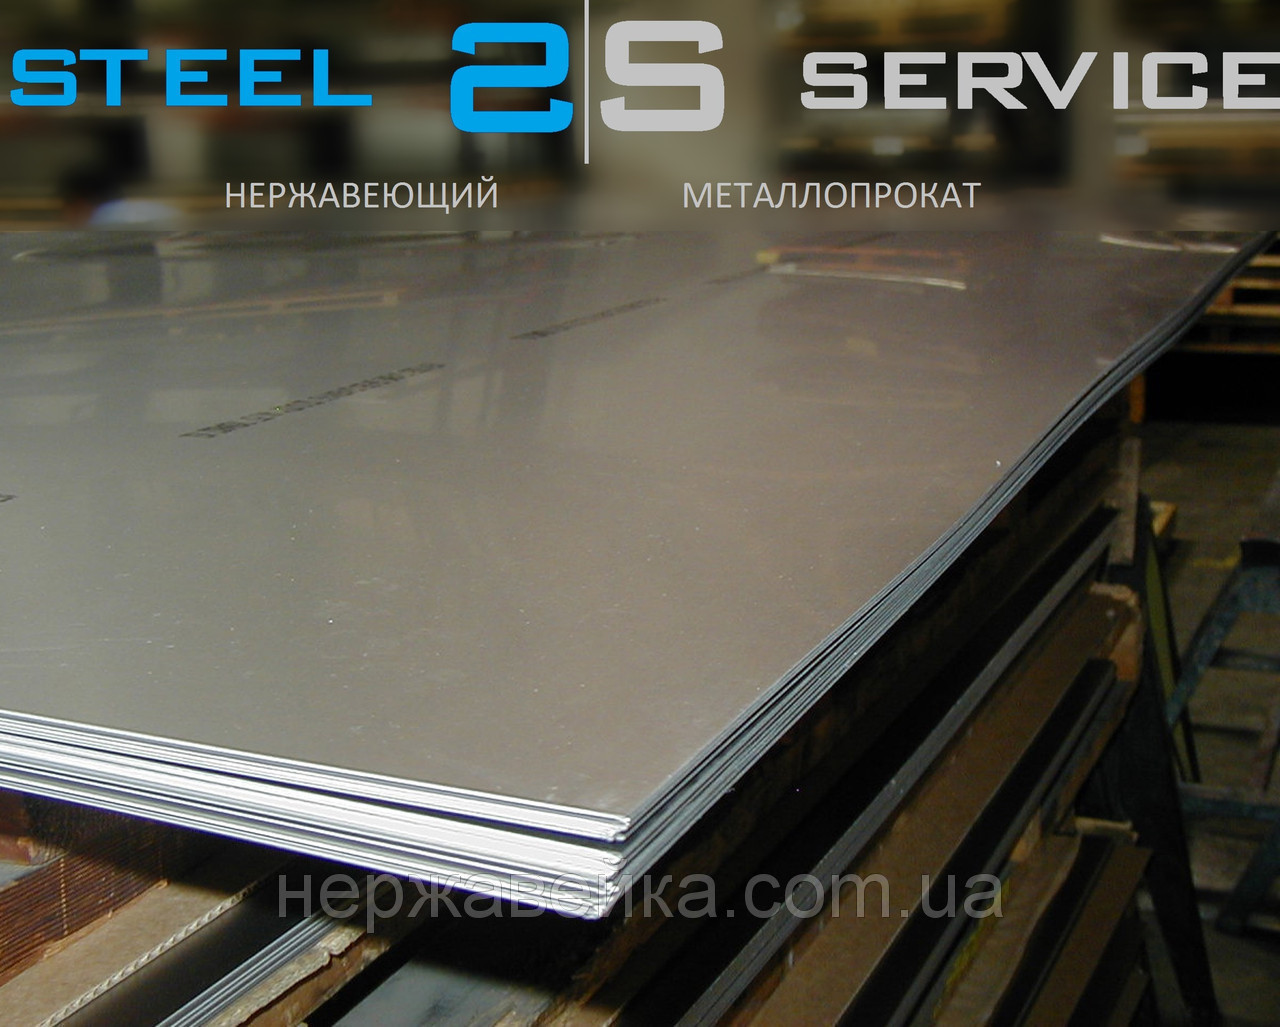 Нержавейка лист 0,8х1000х2000мм  AISI 316Ti(10Х17Н13М2Т) 2B - матовый,  кислотостойкий